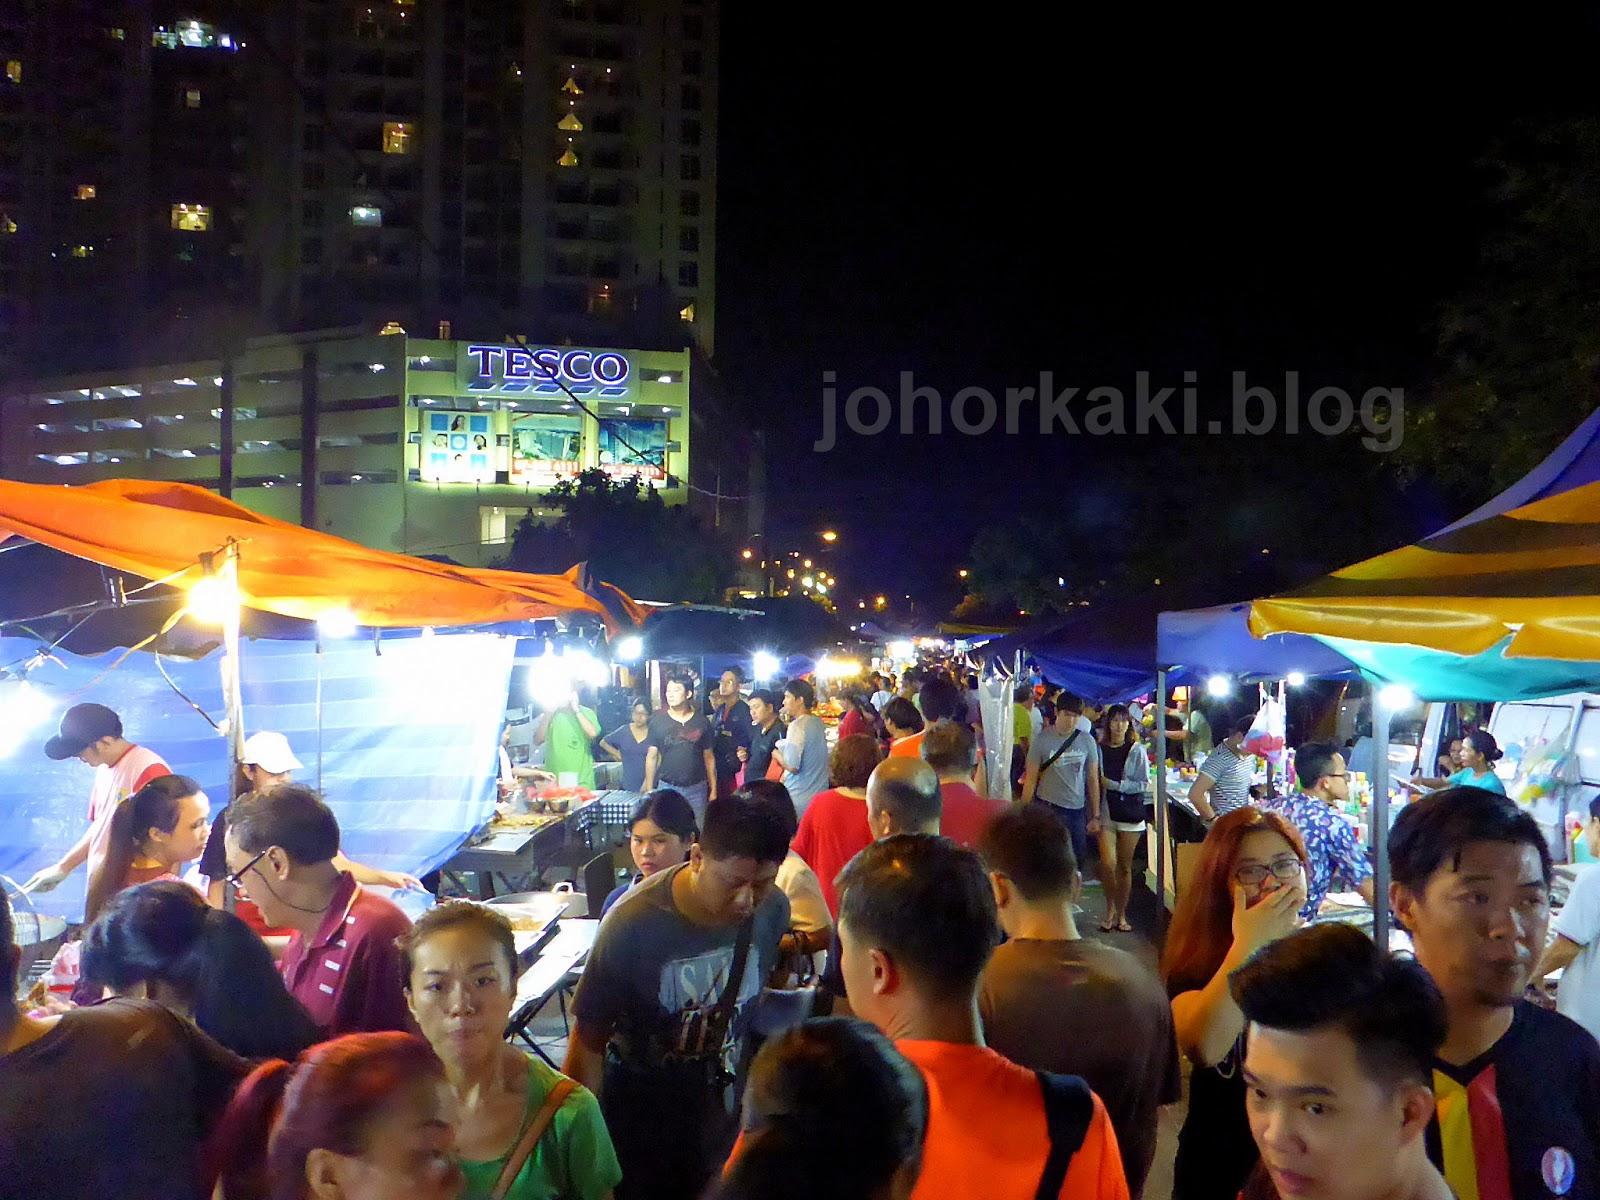 Paragon Suites JB @ CIQ - Latest Updates! Johor Bahru